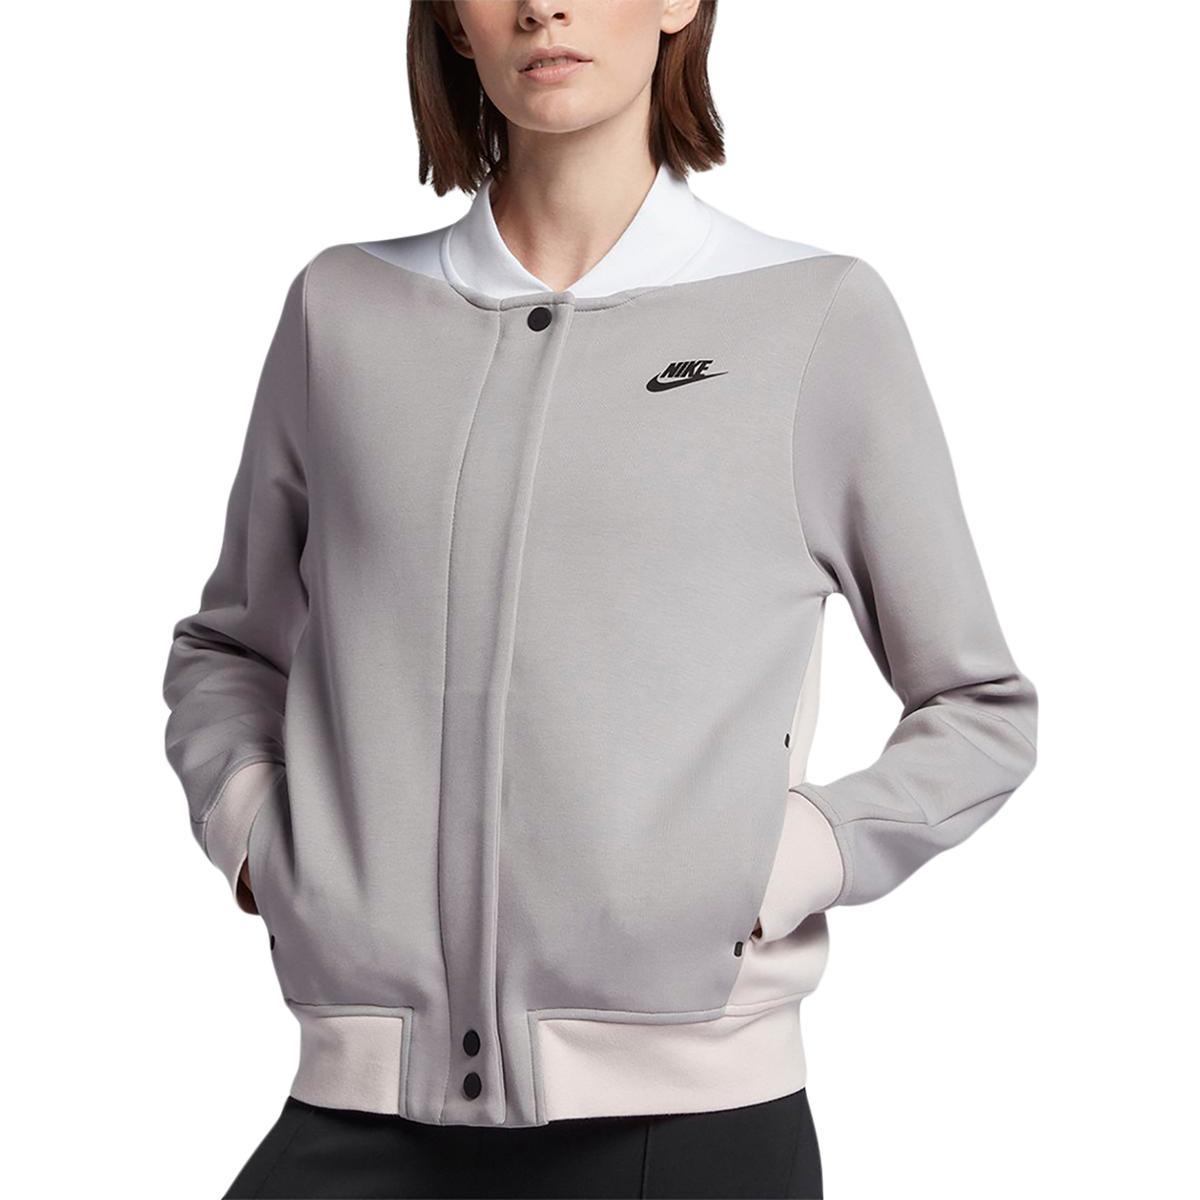 697569f370c5 Nike Womens Gray Fall Fleece Lightweight Bomber Jacket Outerwear M BHFO 0924